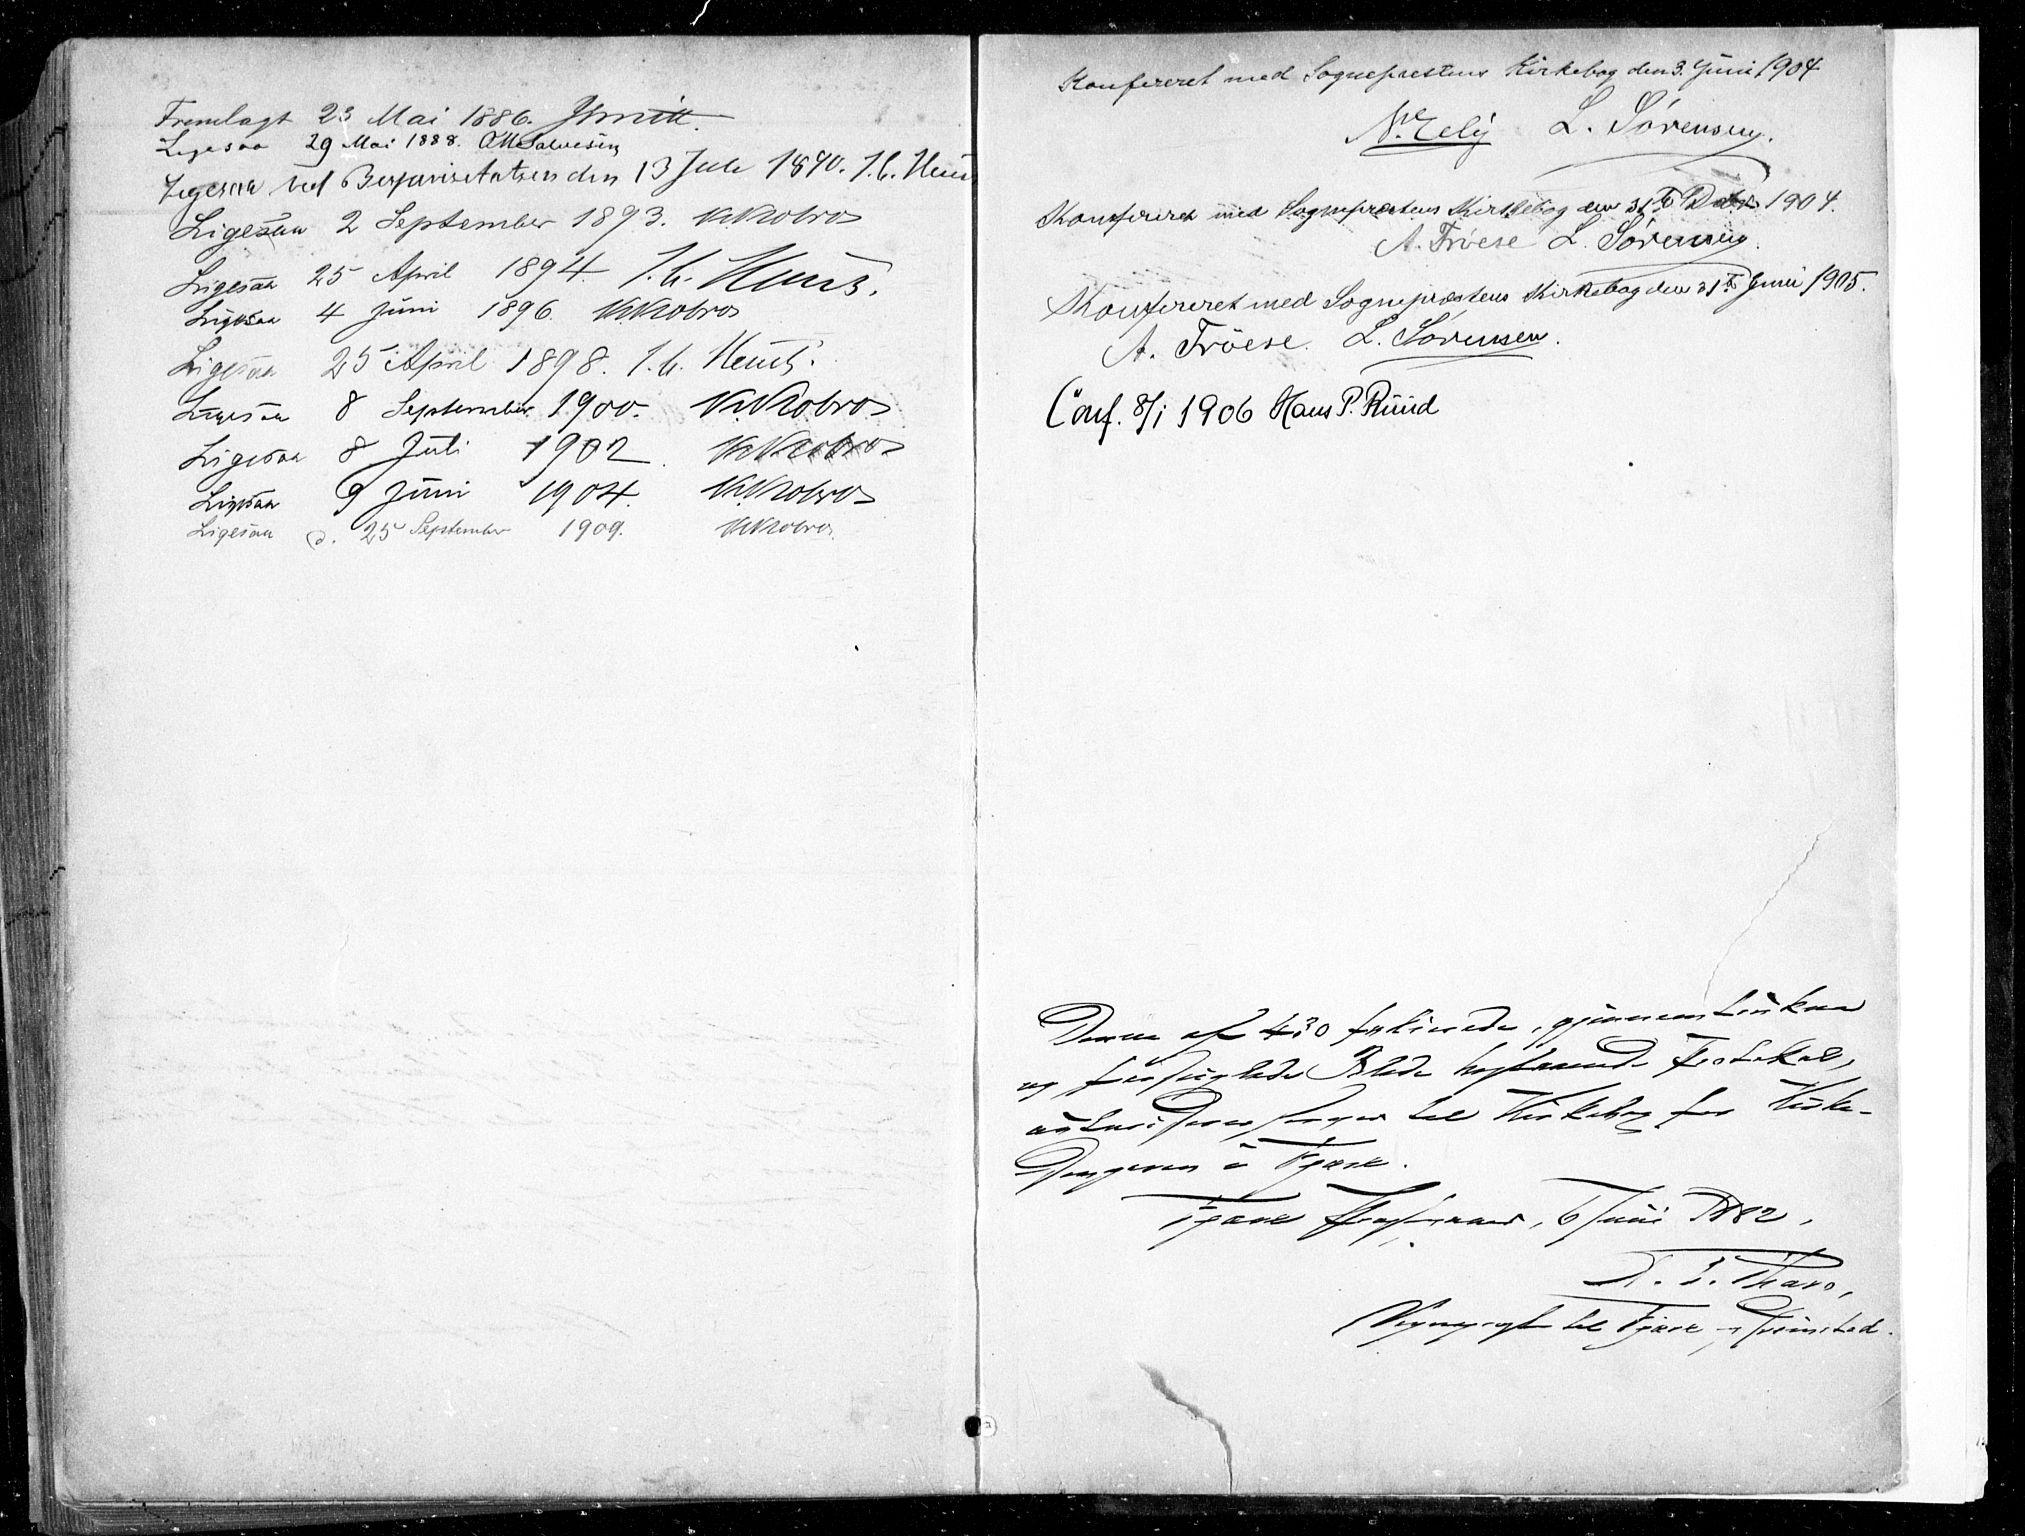 SAK, Fjære sokneprestkontor, F/Fb/L0011: Klokkerbok nr. B 11, 1881-1905